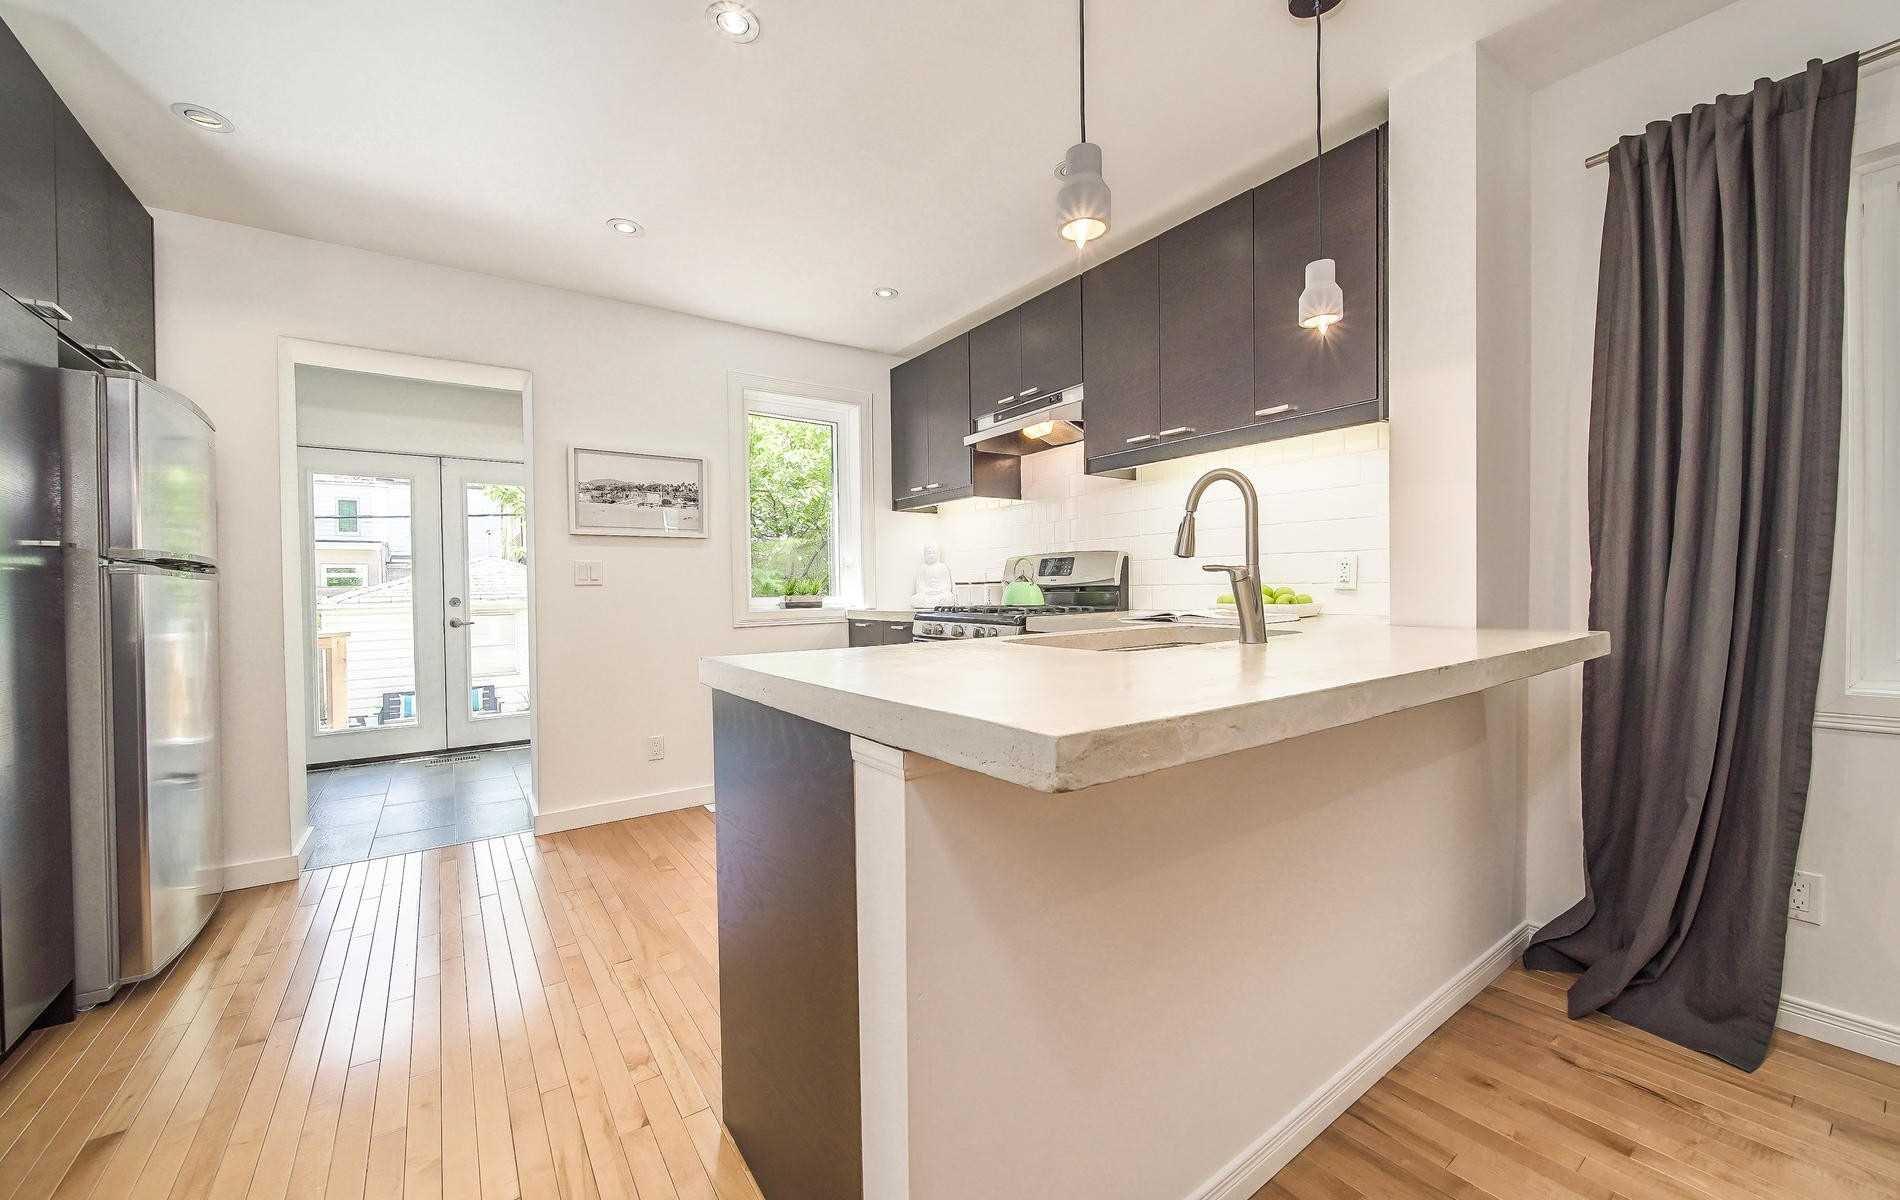 Photo 6: Photos: 64 Larchmount Avenue in Toronto: South Riverdale House (2-Storey) for sale (Toronto E01)  : MLS®# E4489752